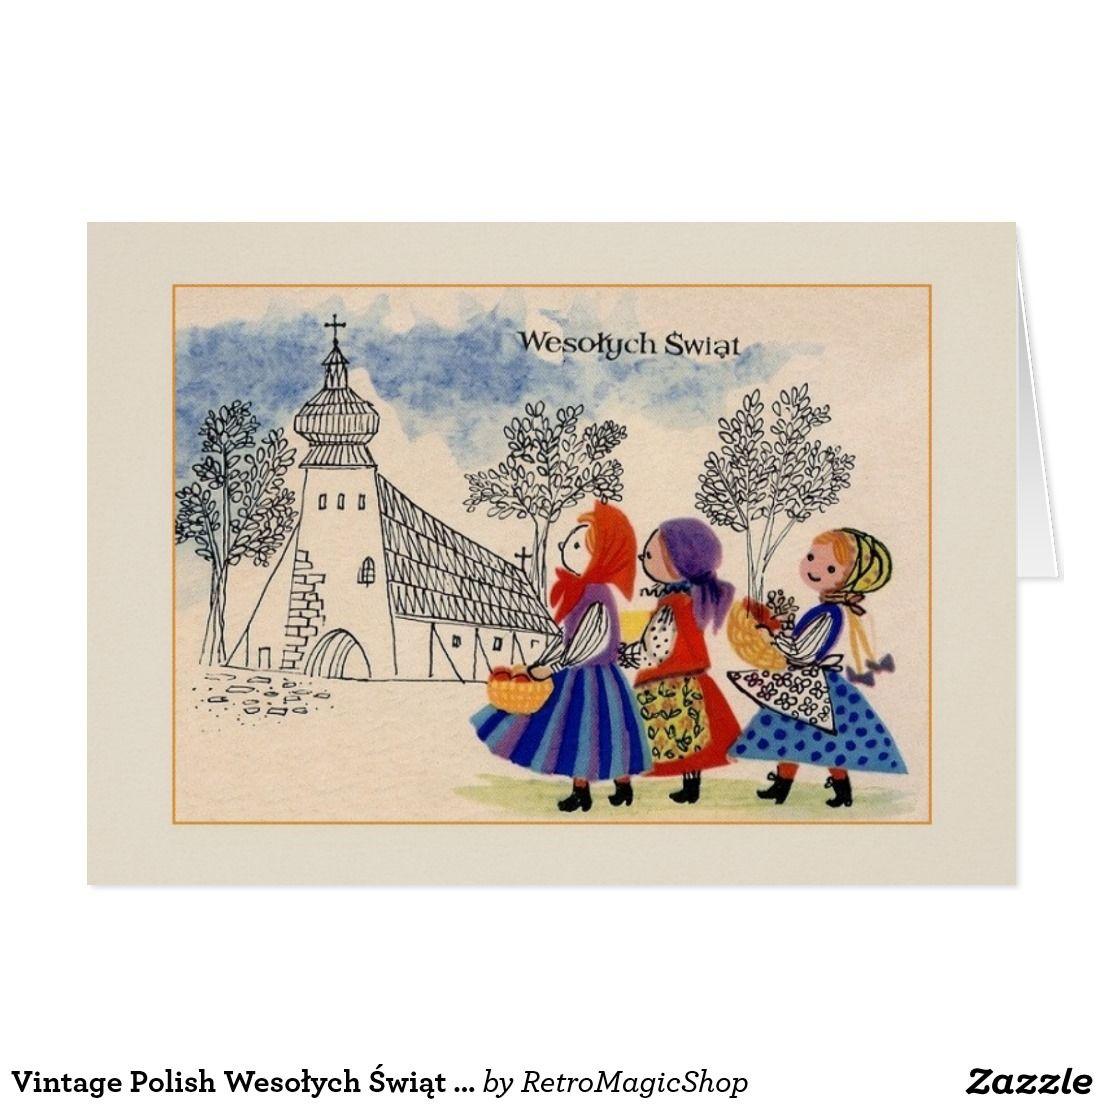 Vintage Polish Wesołych Świąt Christmas Card | Old world holidays ...